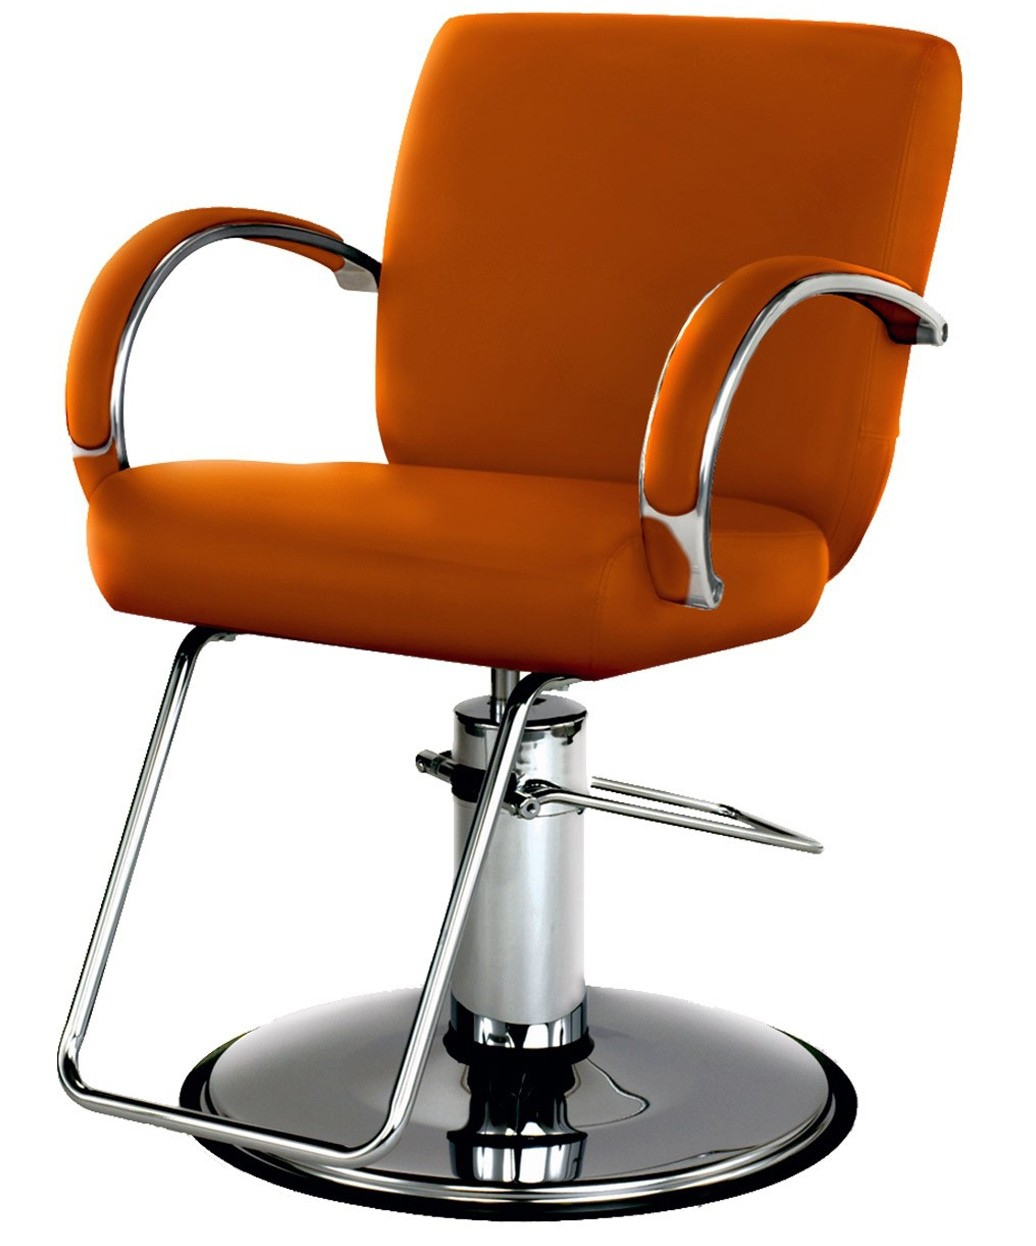 belmont barber chair parts kids sports chairs takara st e10 odin styling